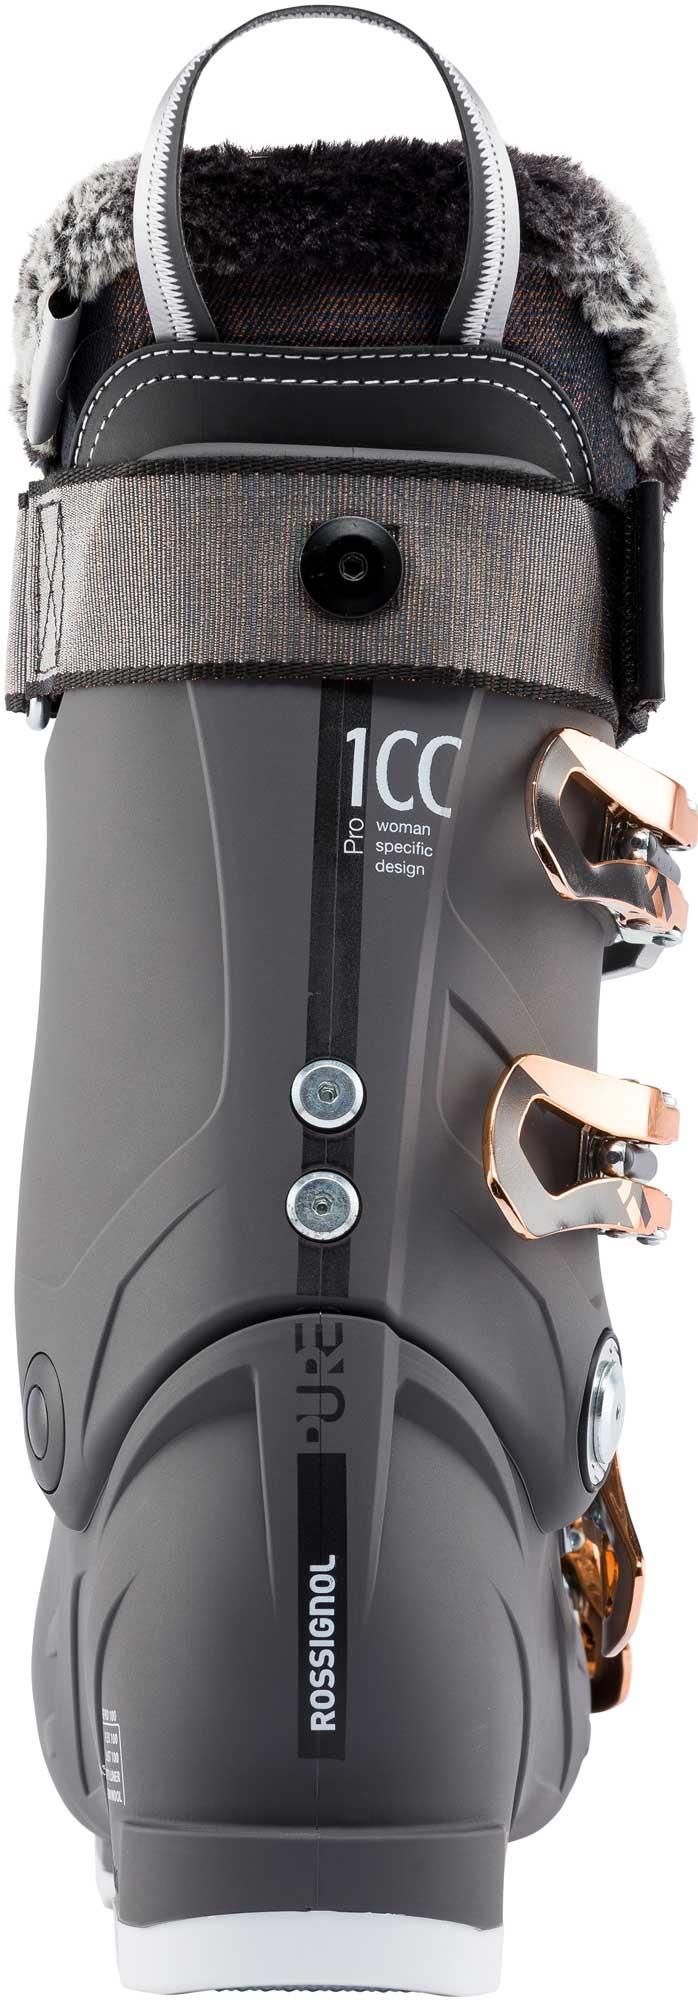 Chaussures De Ski Rossignol Pure Pro 100 Graphite par